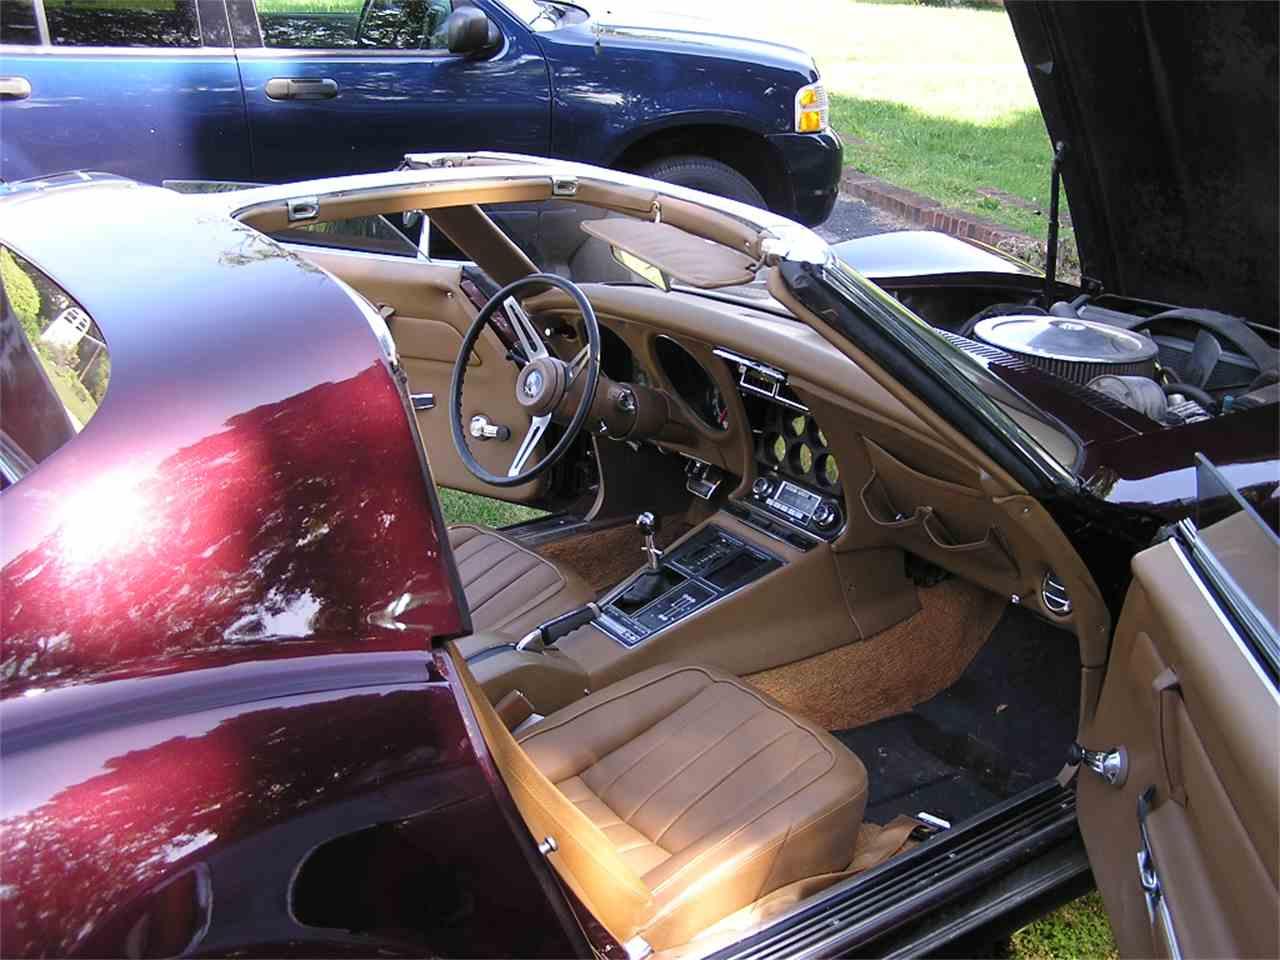 Large Picture of 1969 Chevrolet Corvette located in Virginia - $19,000.00 - 5MKF